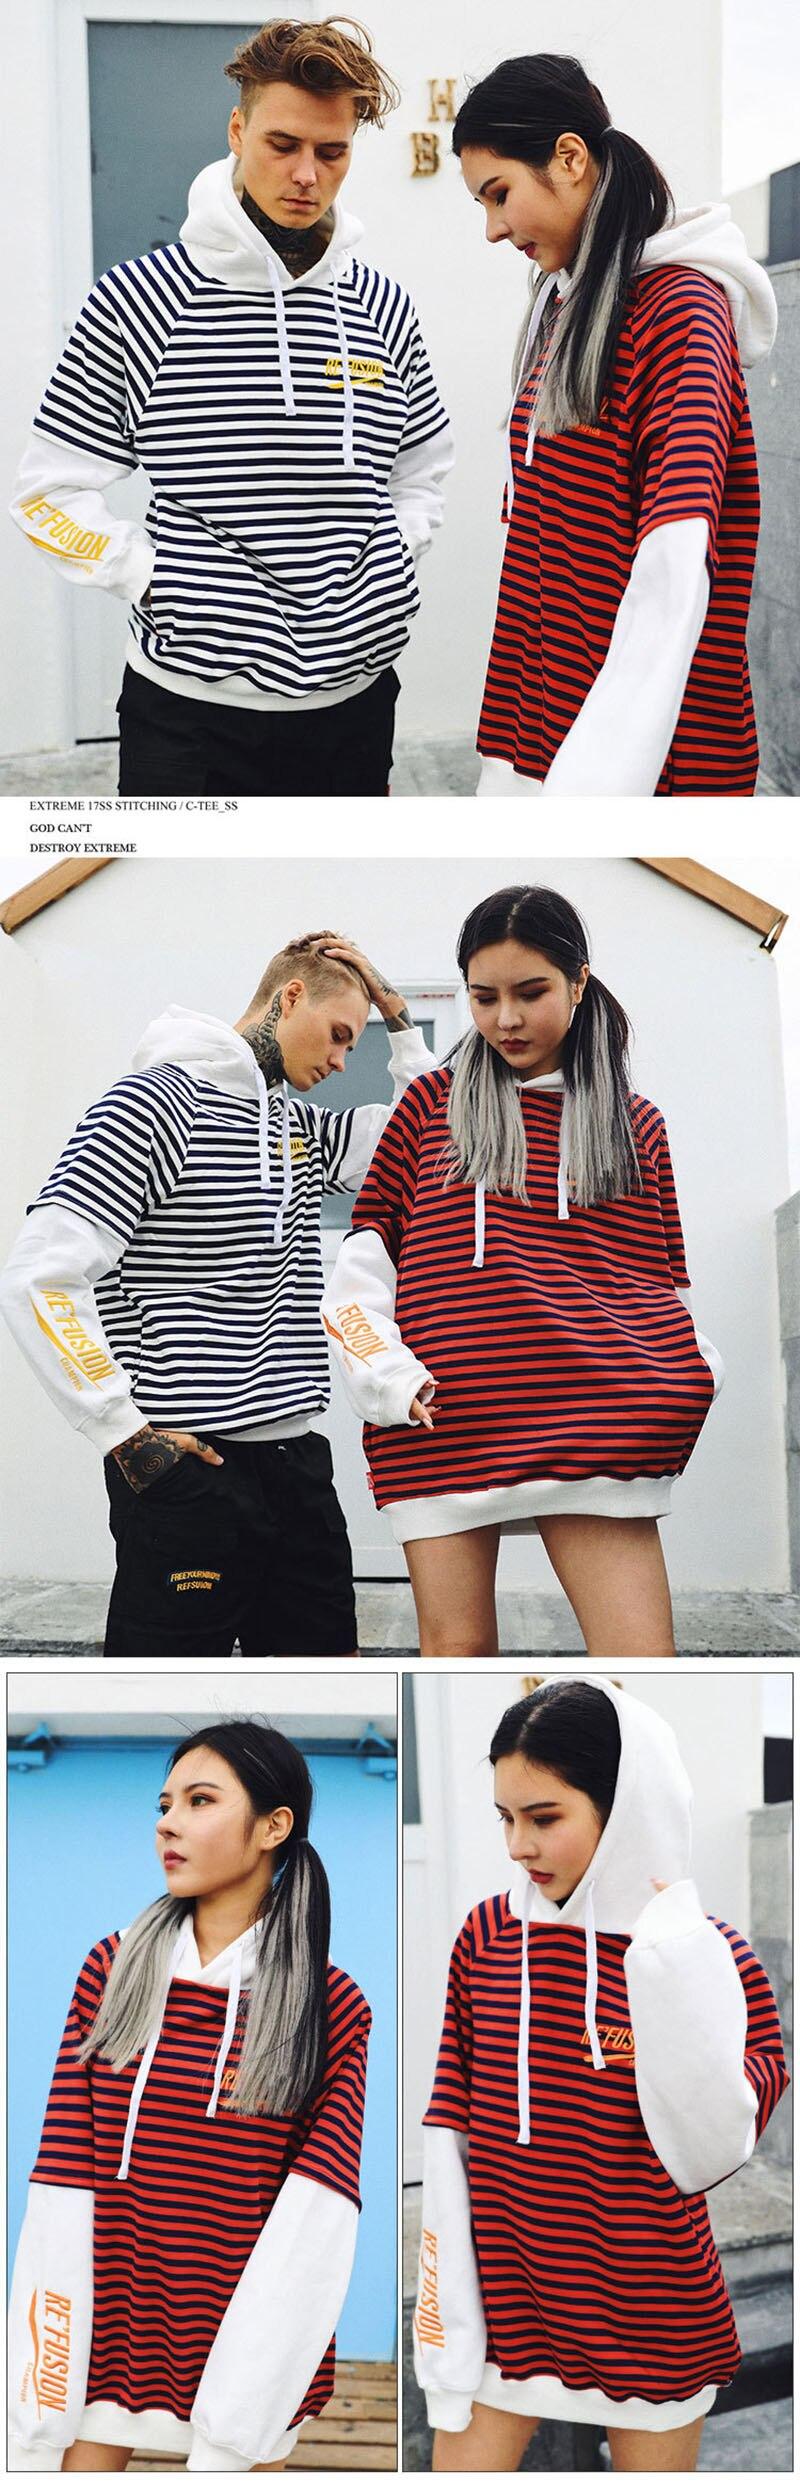 Aolamegs Male Sweatshirt Striped Hooded Sweatshirts O-Neck Pullover Loose Streetwear High Street Hip hop Fashion Winter Couple (11)